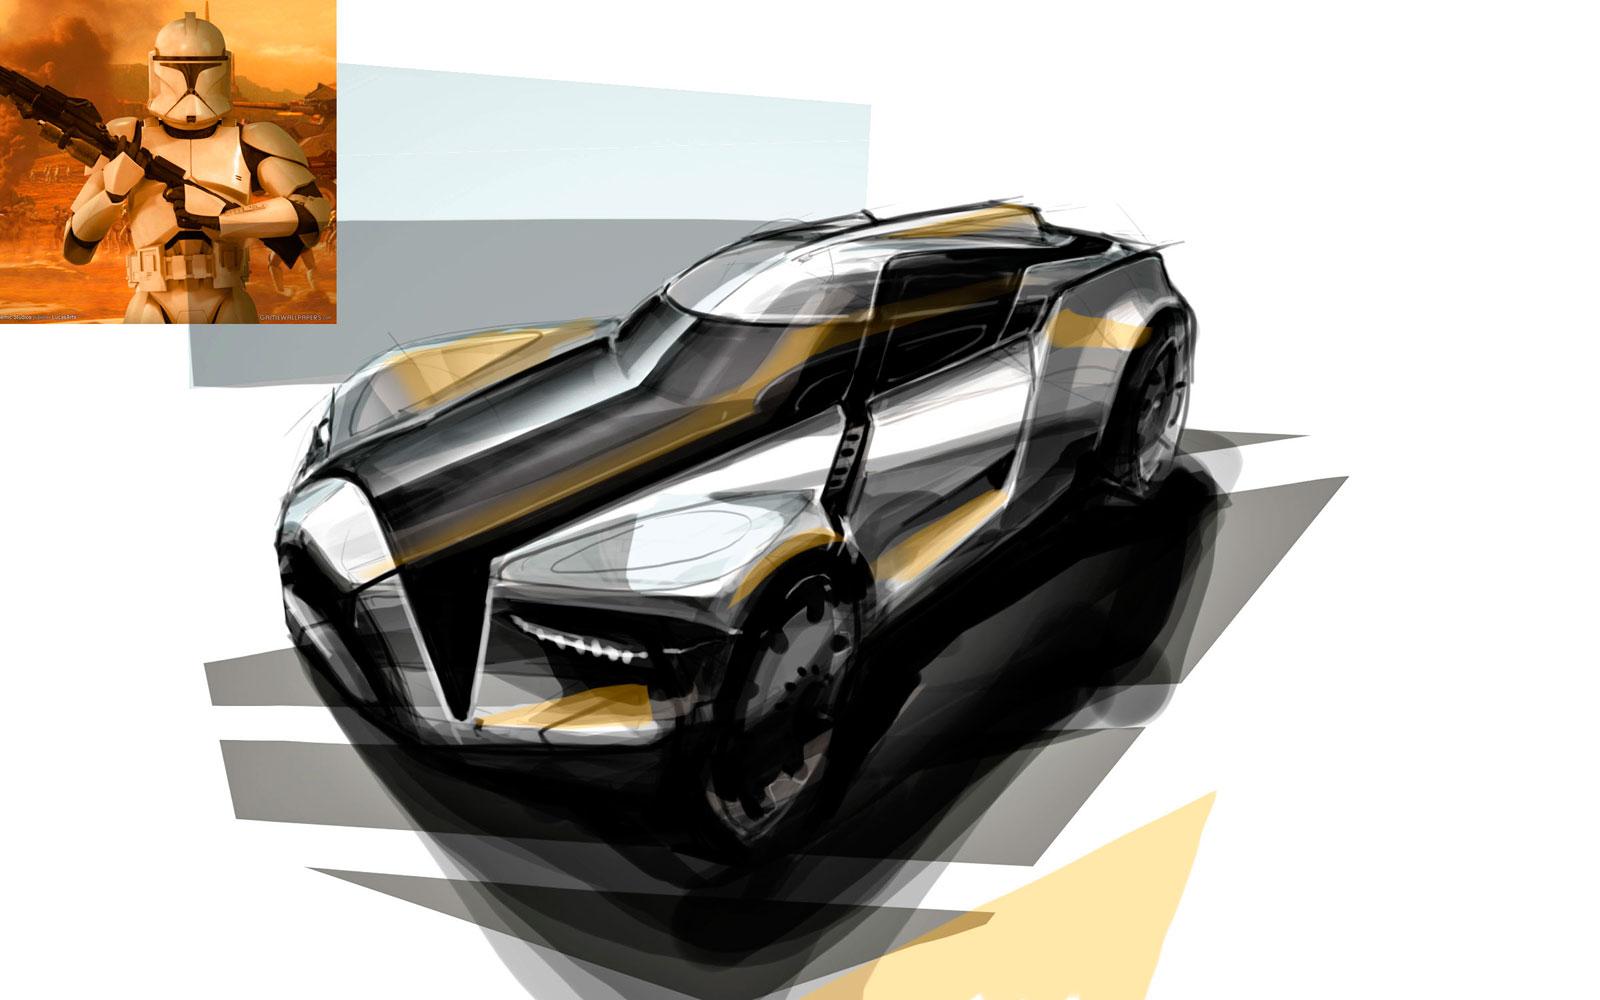 Design Sketches Star Wars Inspired Vehicles Car Body Design